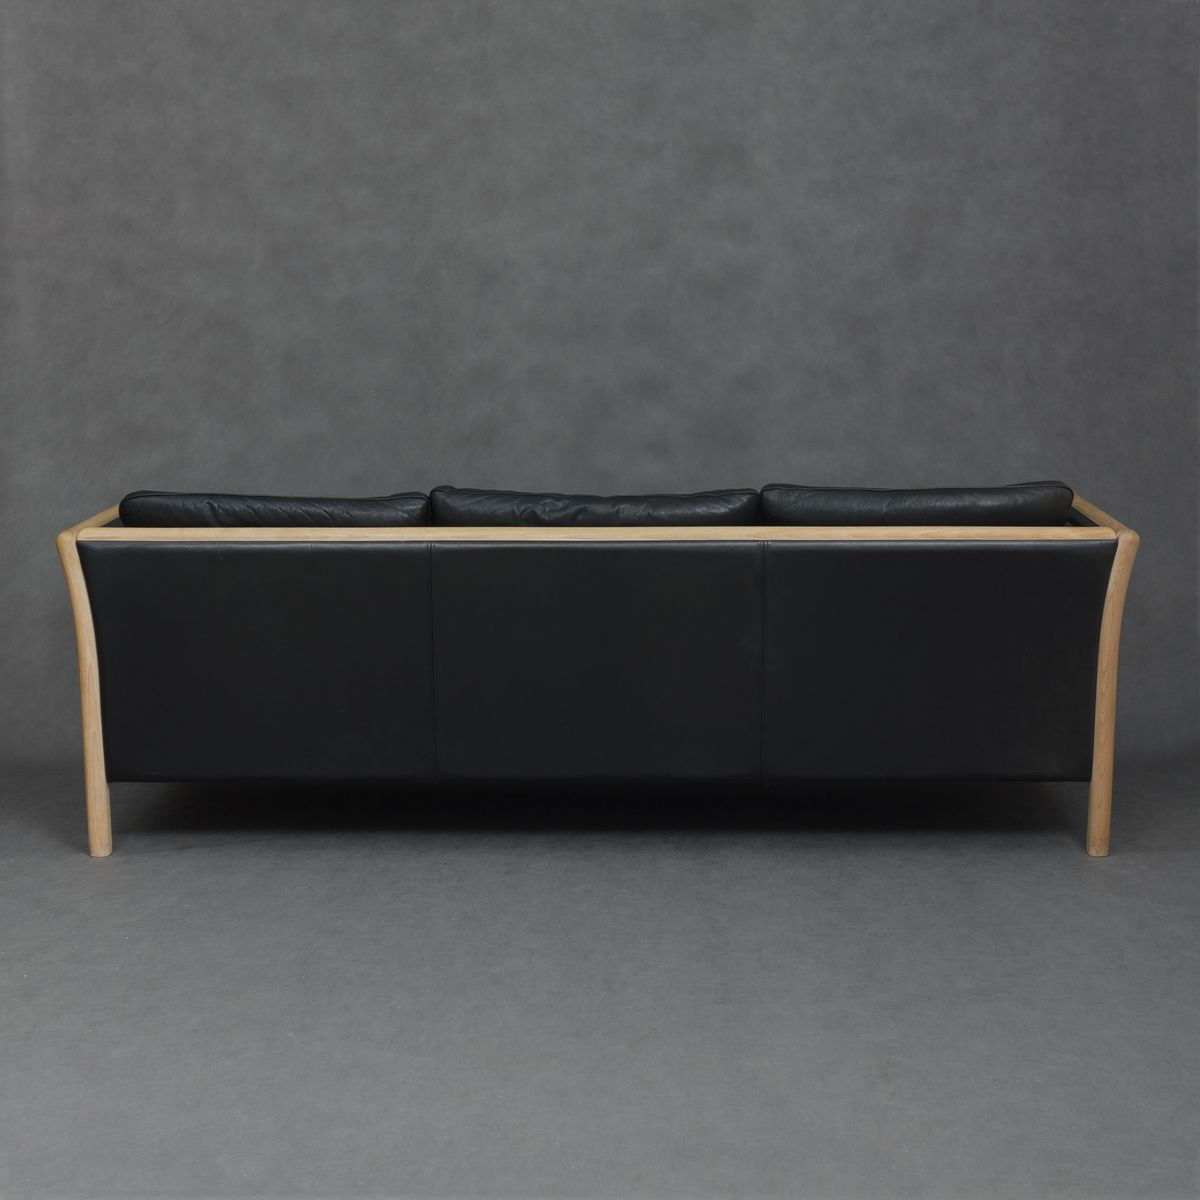 d nisches schwarzes ledersofa von mogens hansen 1980er. Black Bedroom Furniture Sets. Home Design Ideas